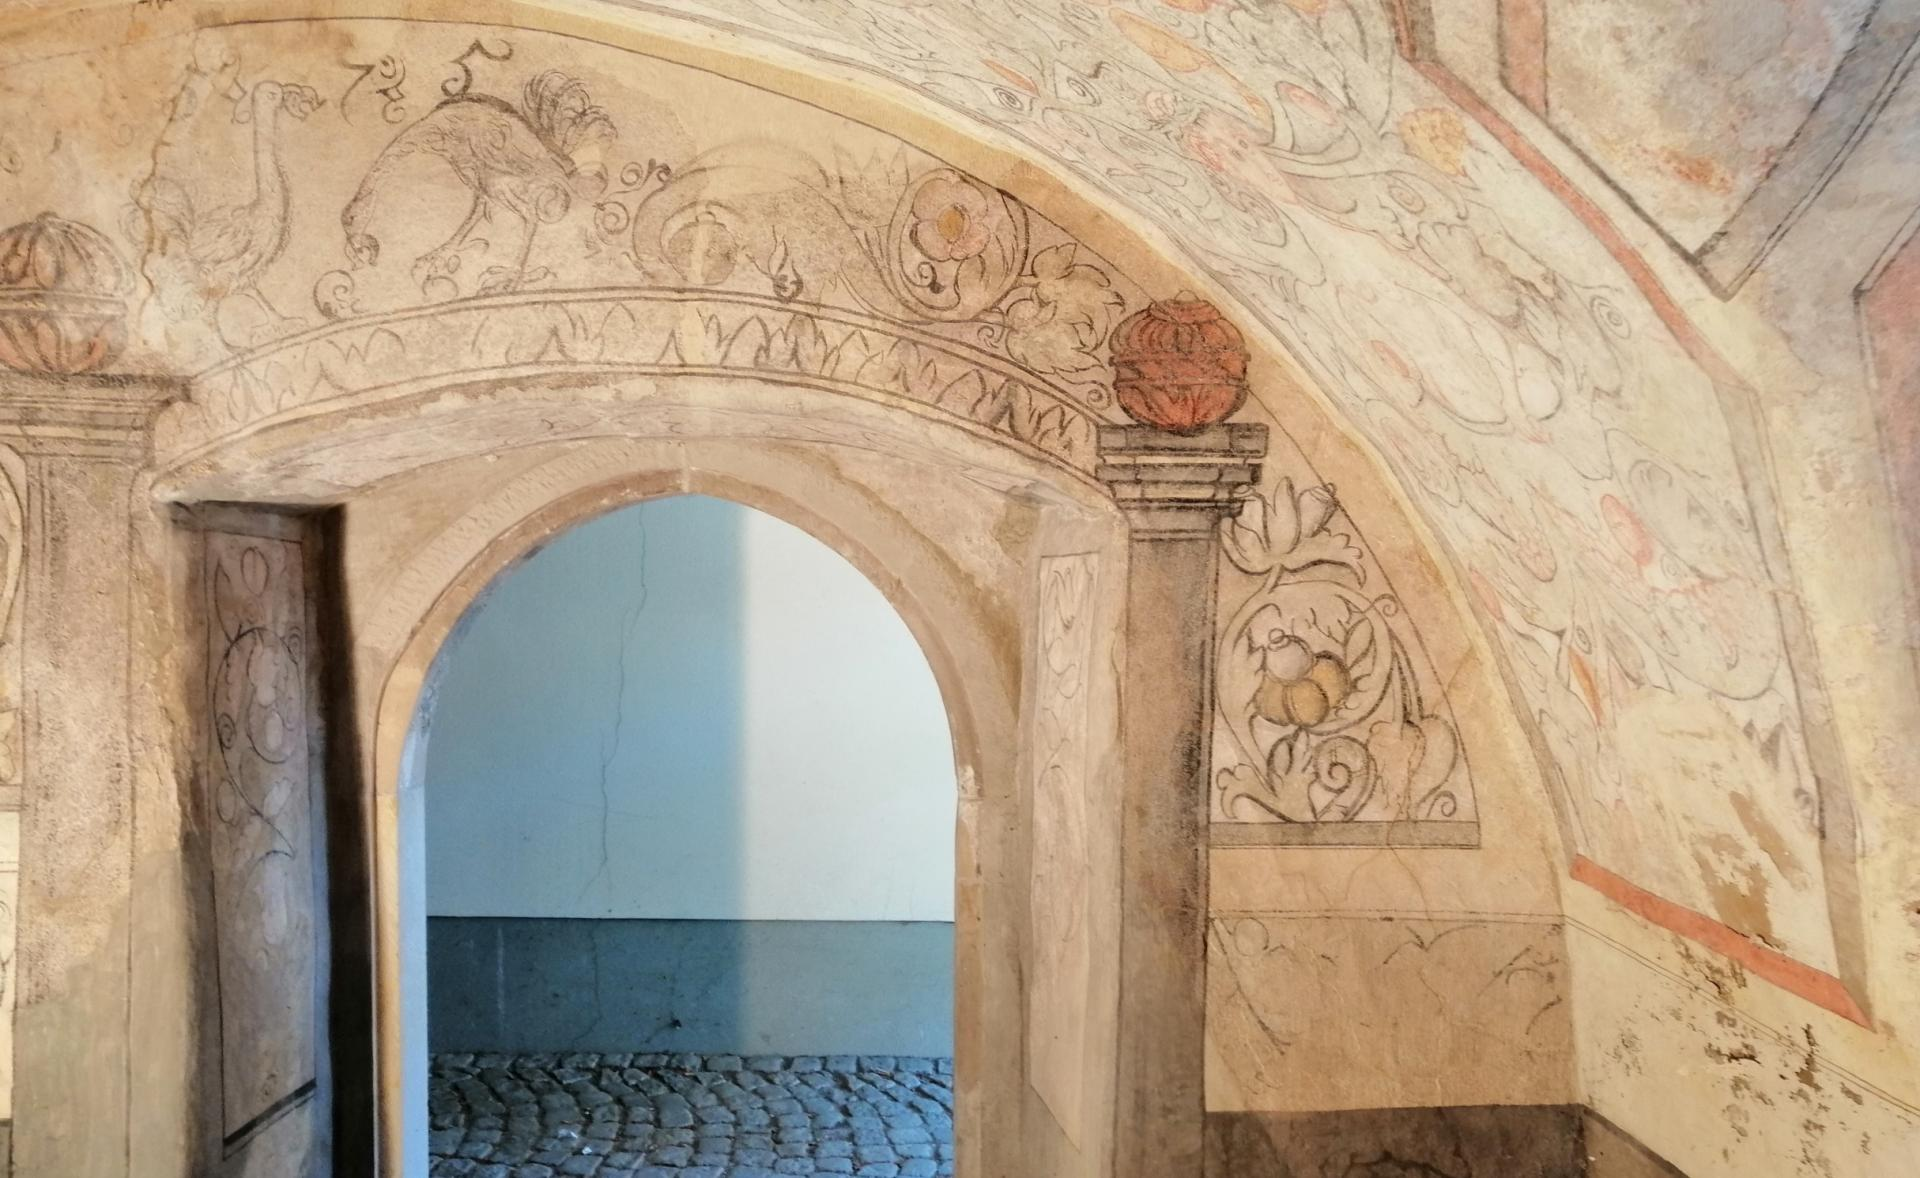 Malerei am Eingangsportal